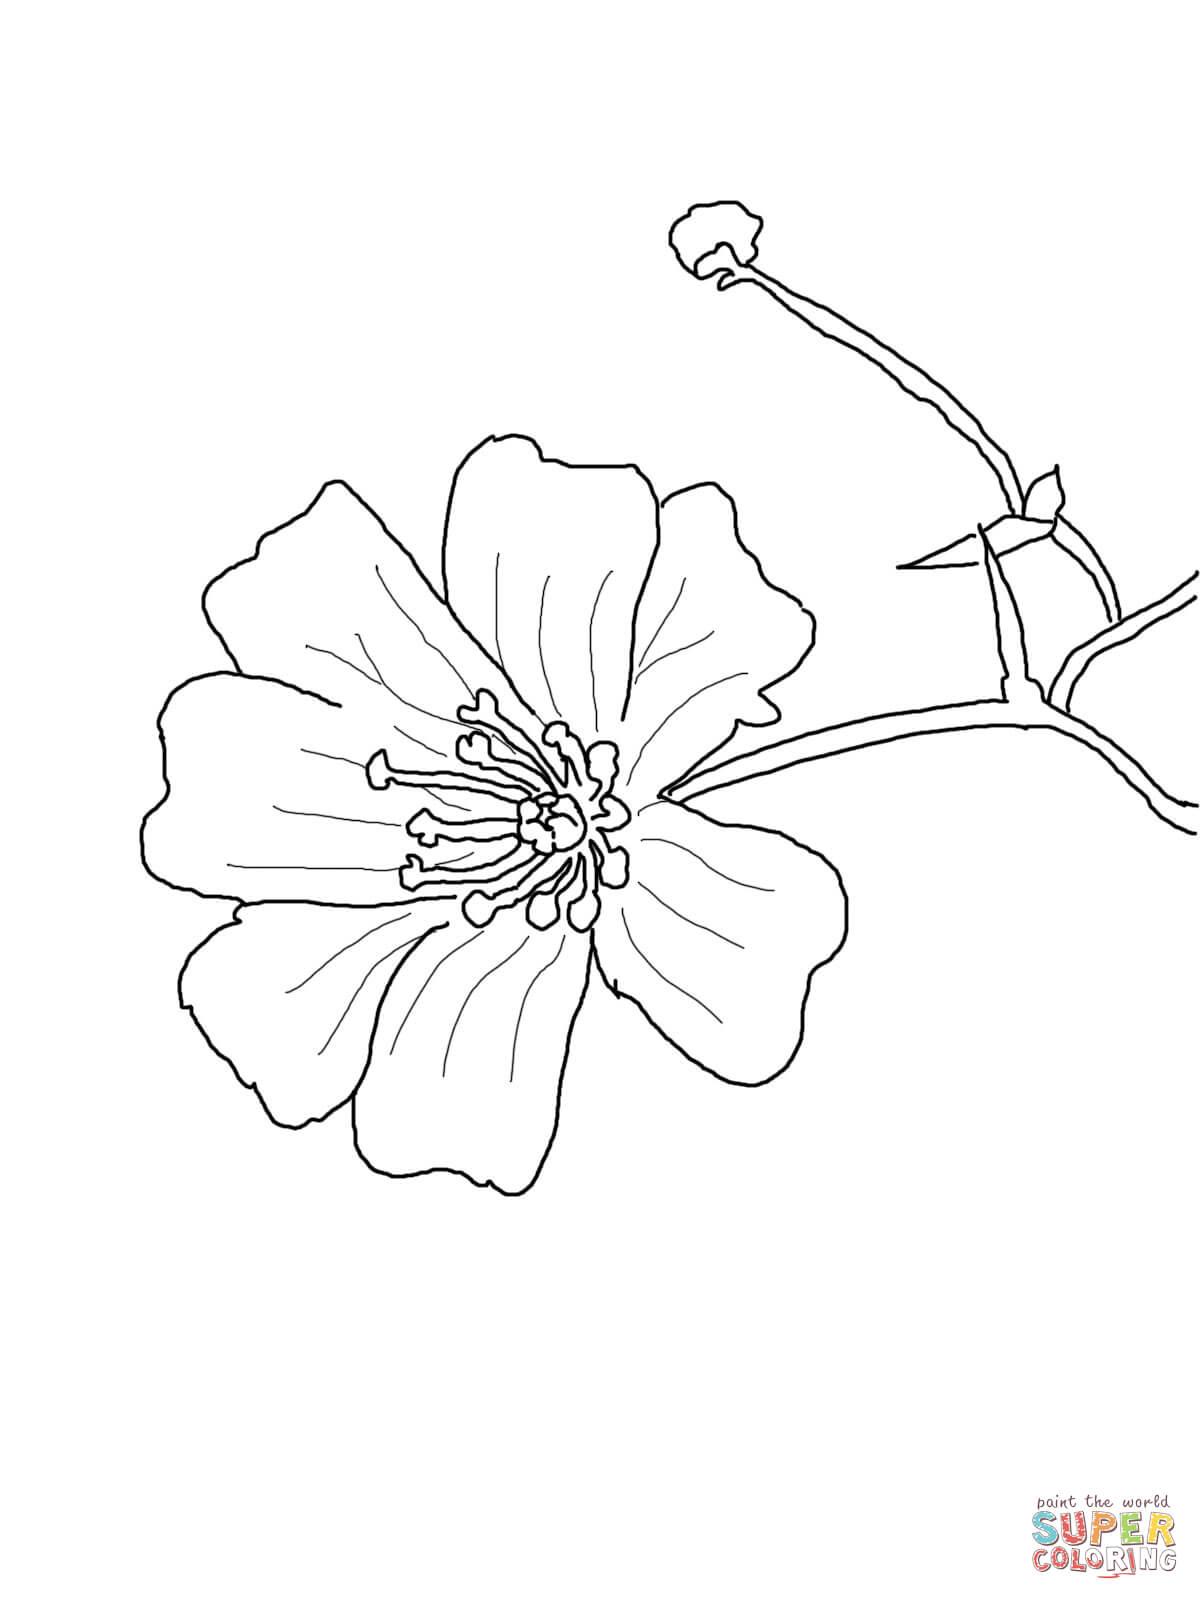 Cosmos Flower Drawing at GetDrawings